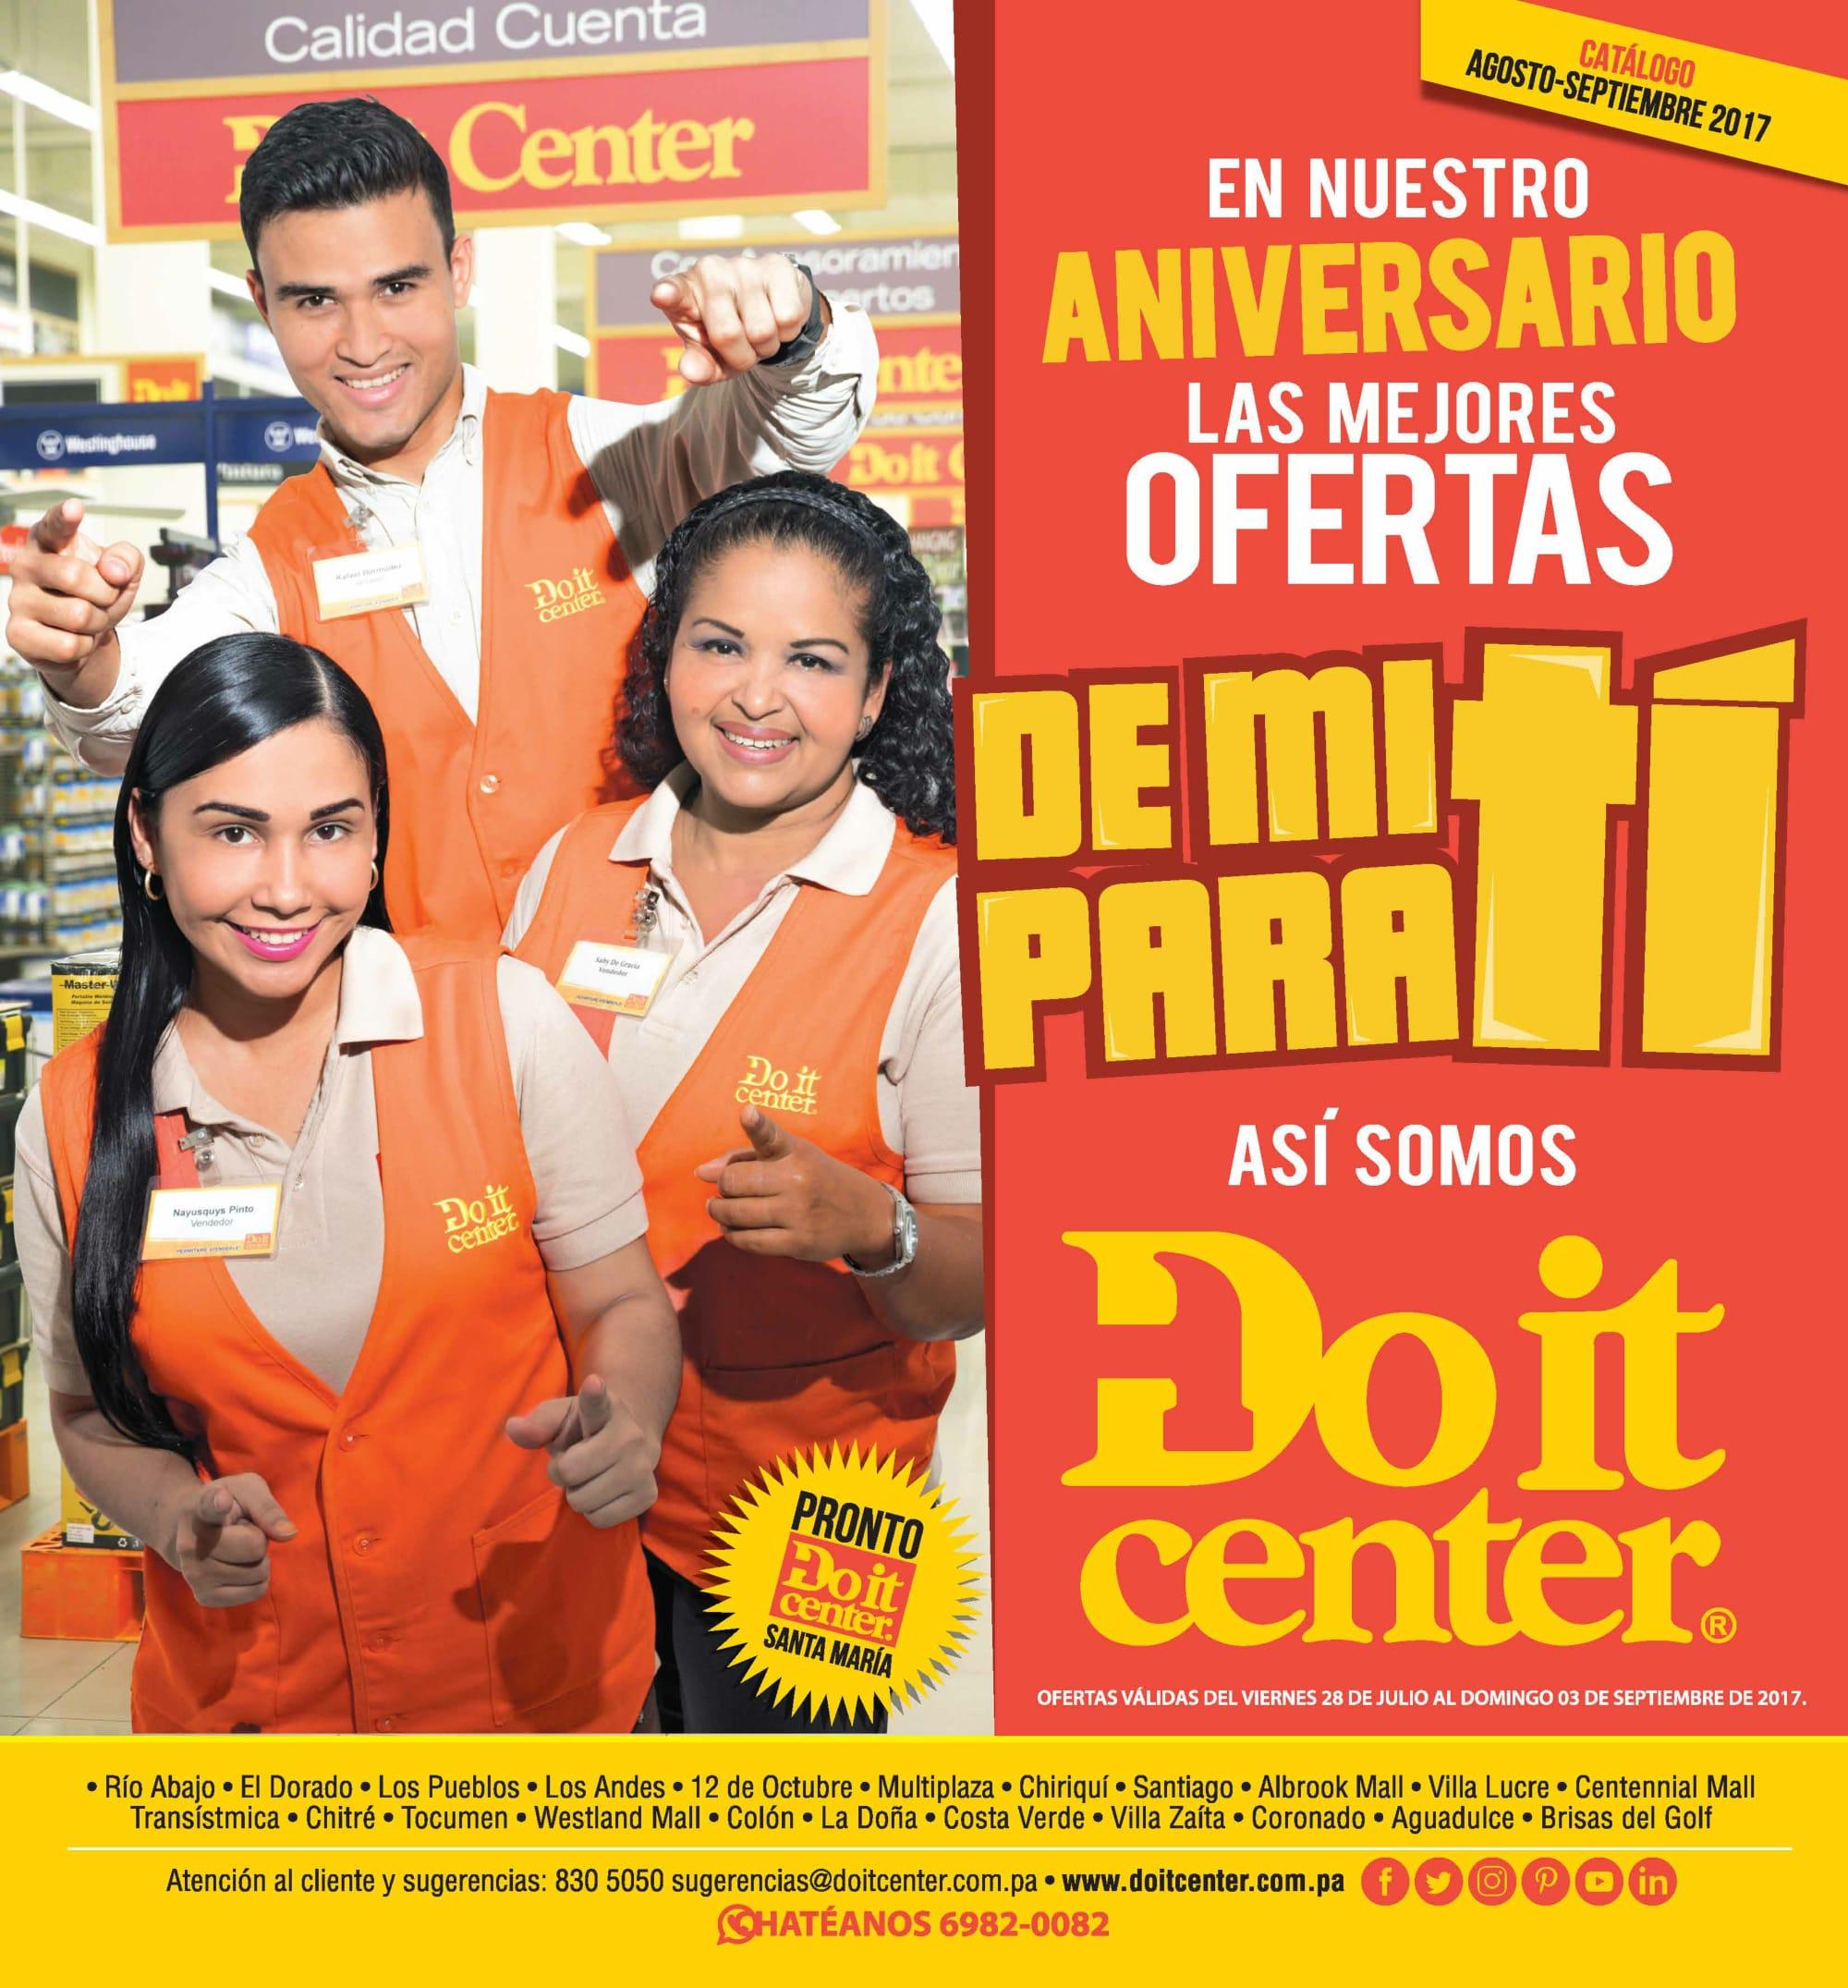 Catalogo do it center agosto septiembre 2017 p1-1